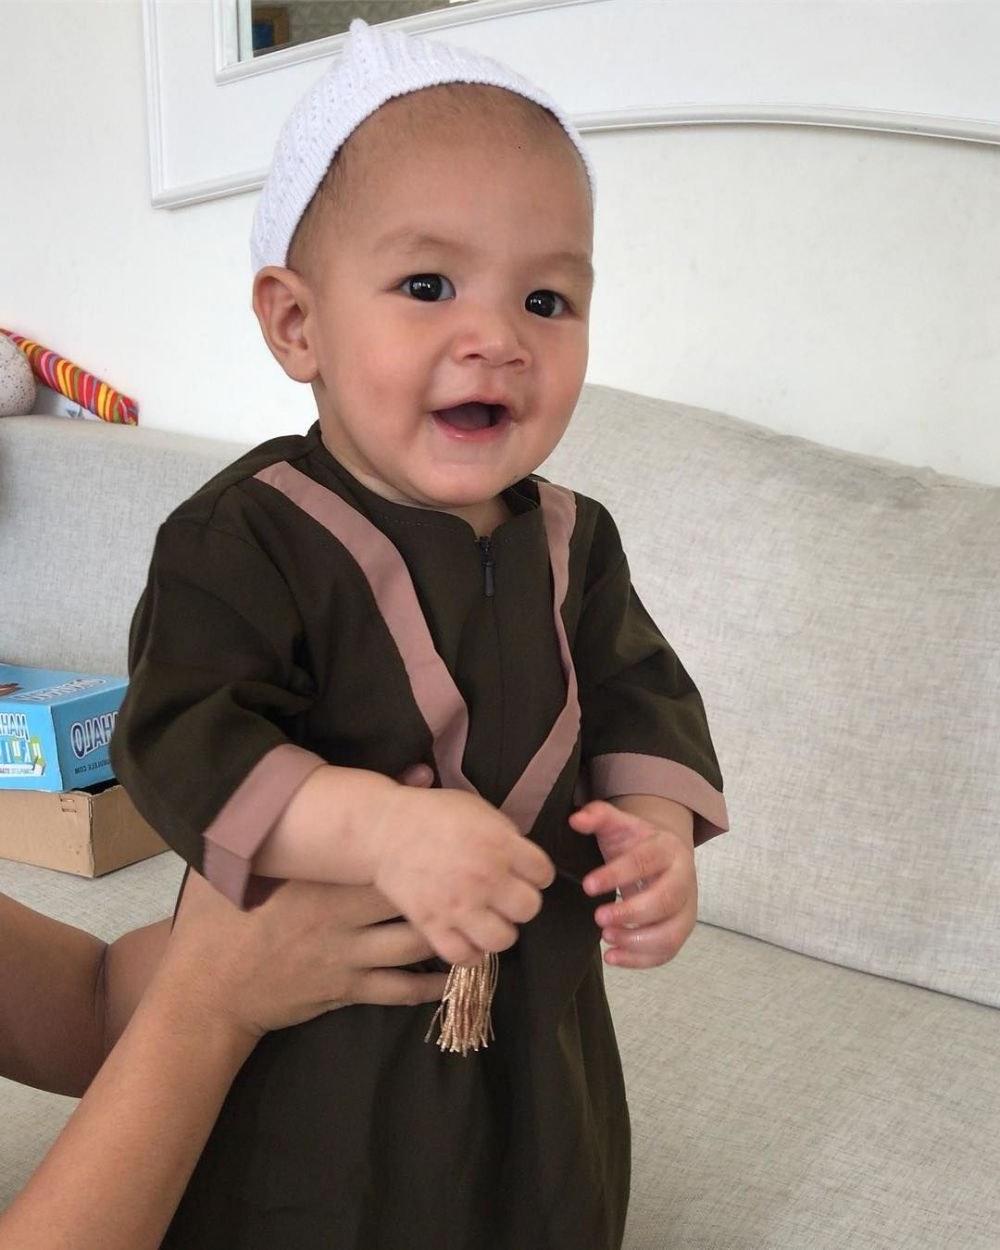 Design Baju Lebaran Anak H9d9 10 Inspirasi Baju Lebaran Anak Seleb Modis Dan Stylish